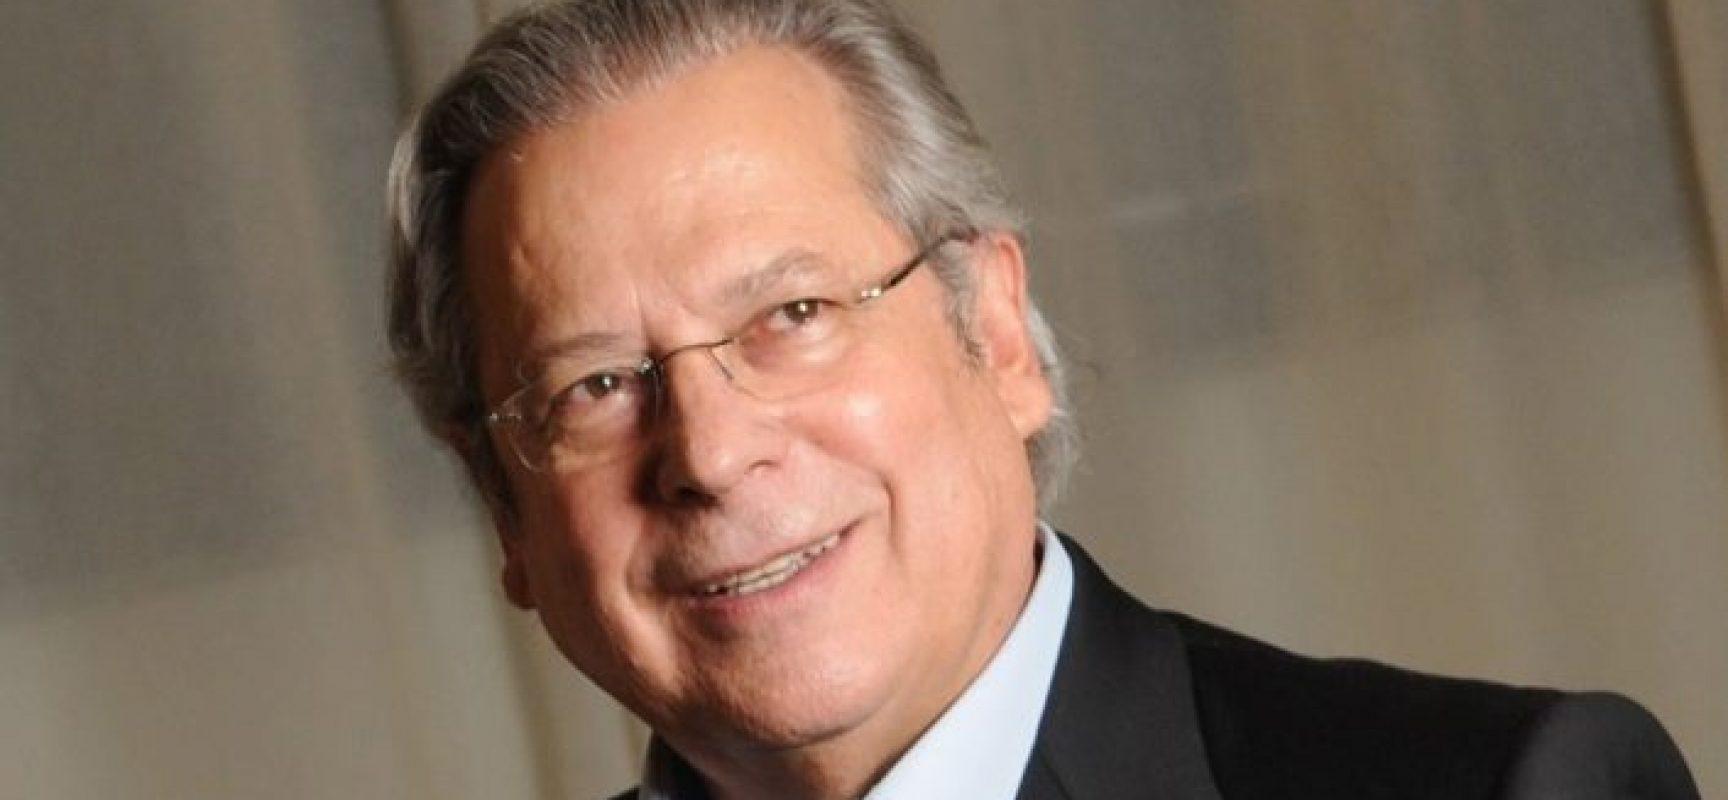 Juíza determina prisão do ex-ministro José Dirceu